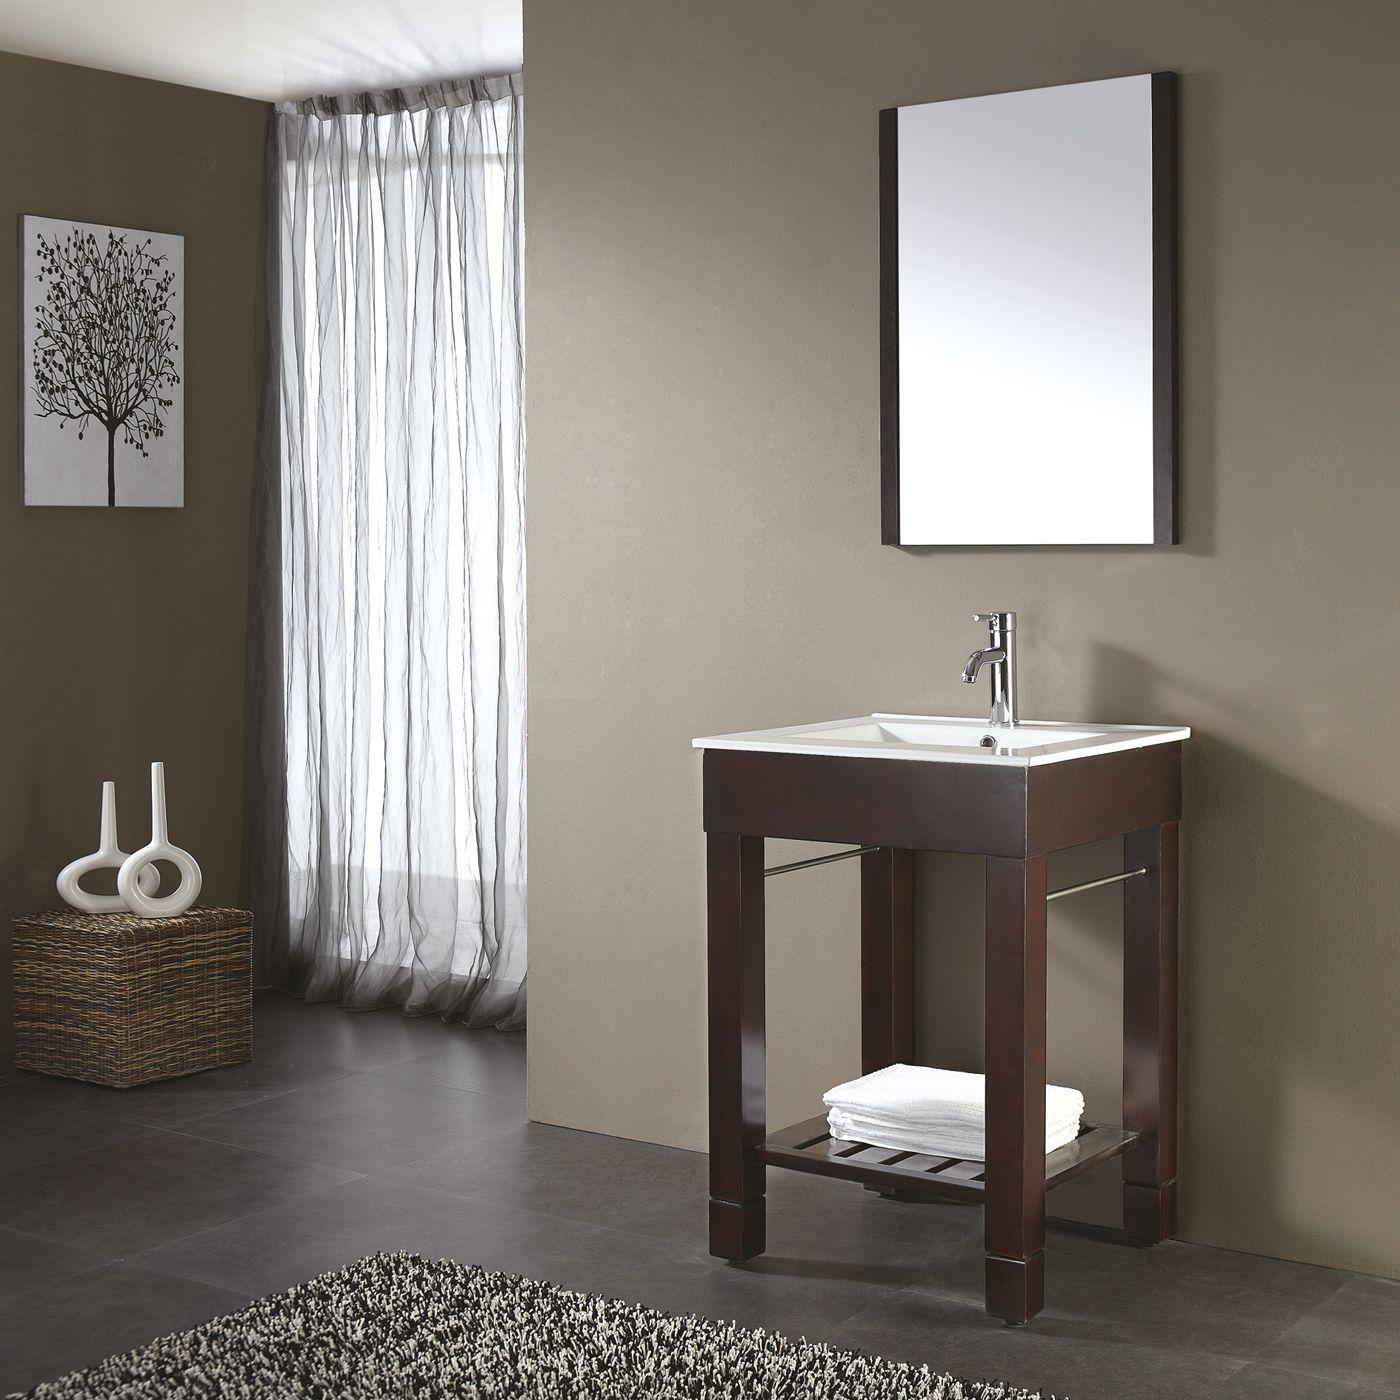 Shop Avanity LOFTV Dark Walnut Bathroom Vanity At Lowes Canada - Lowe's canada bathroom vanities for bathroom decor ideas